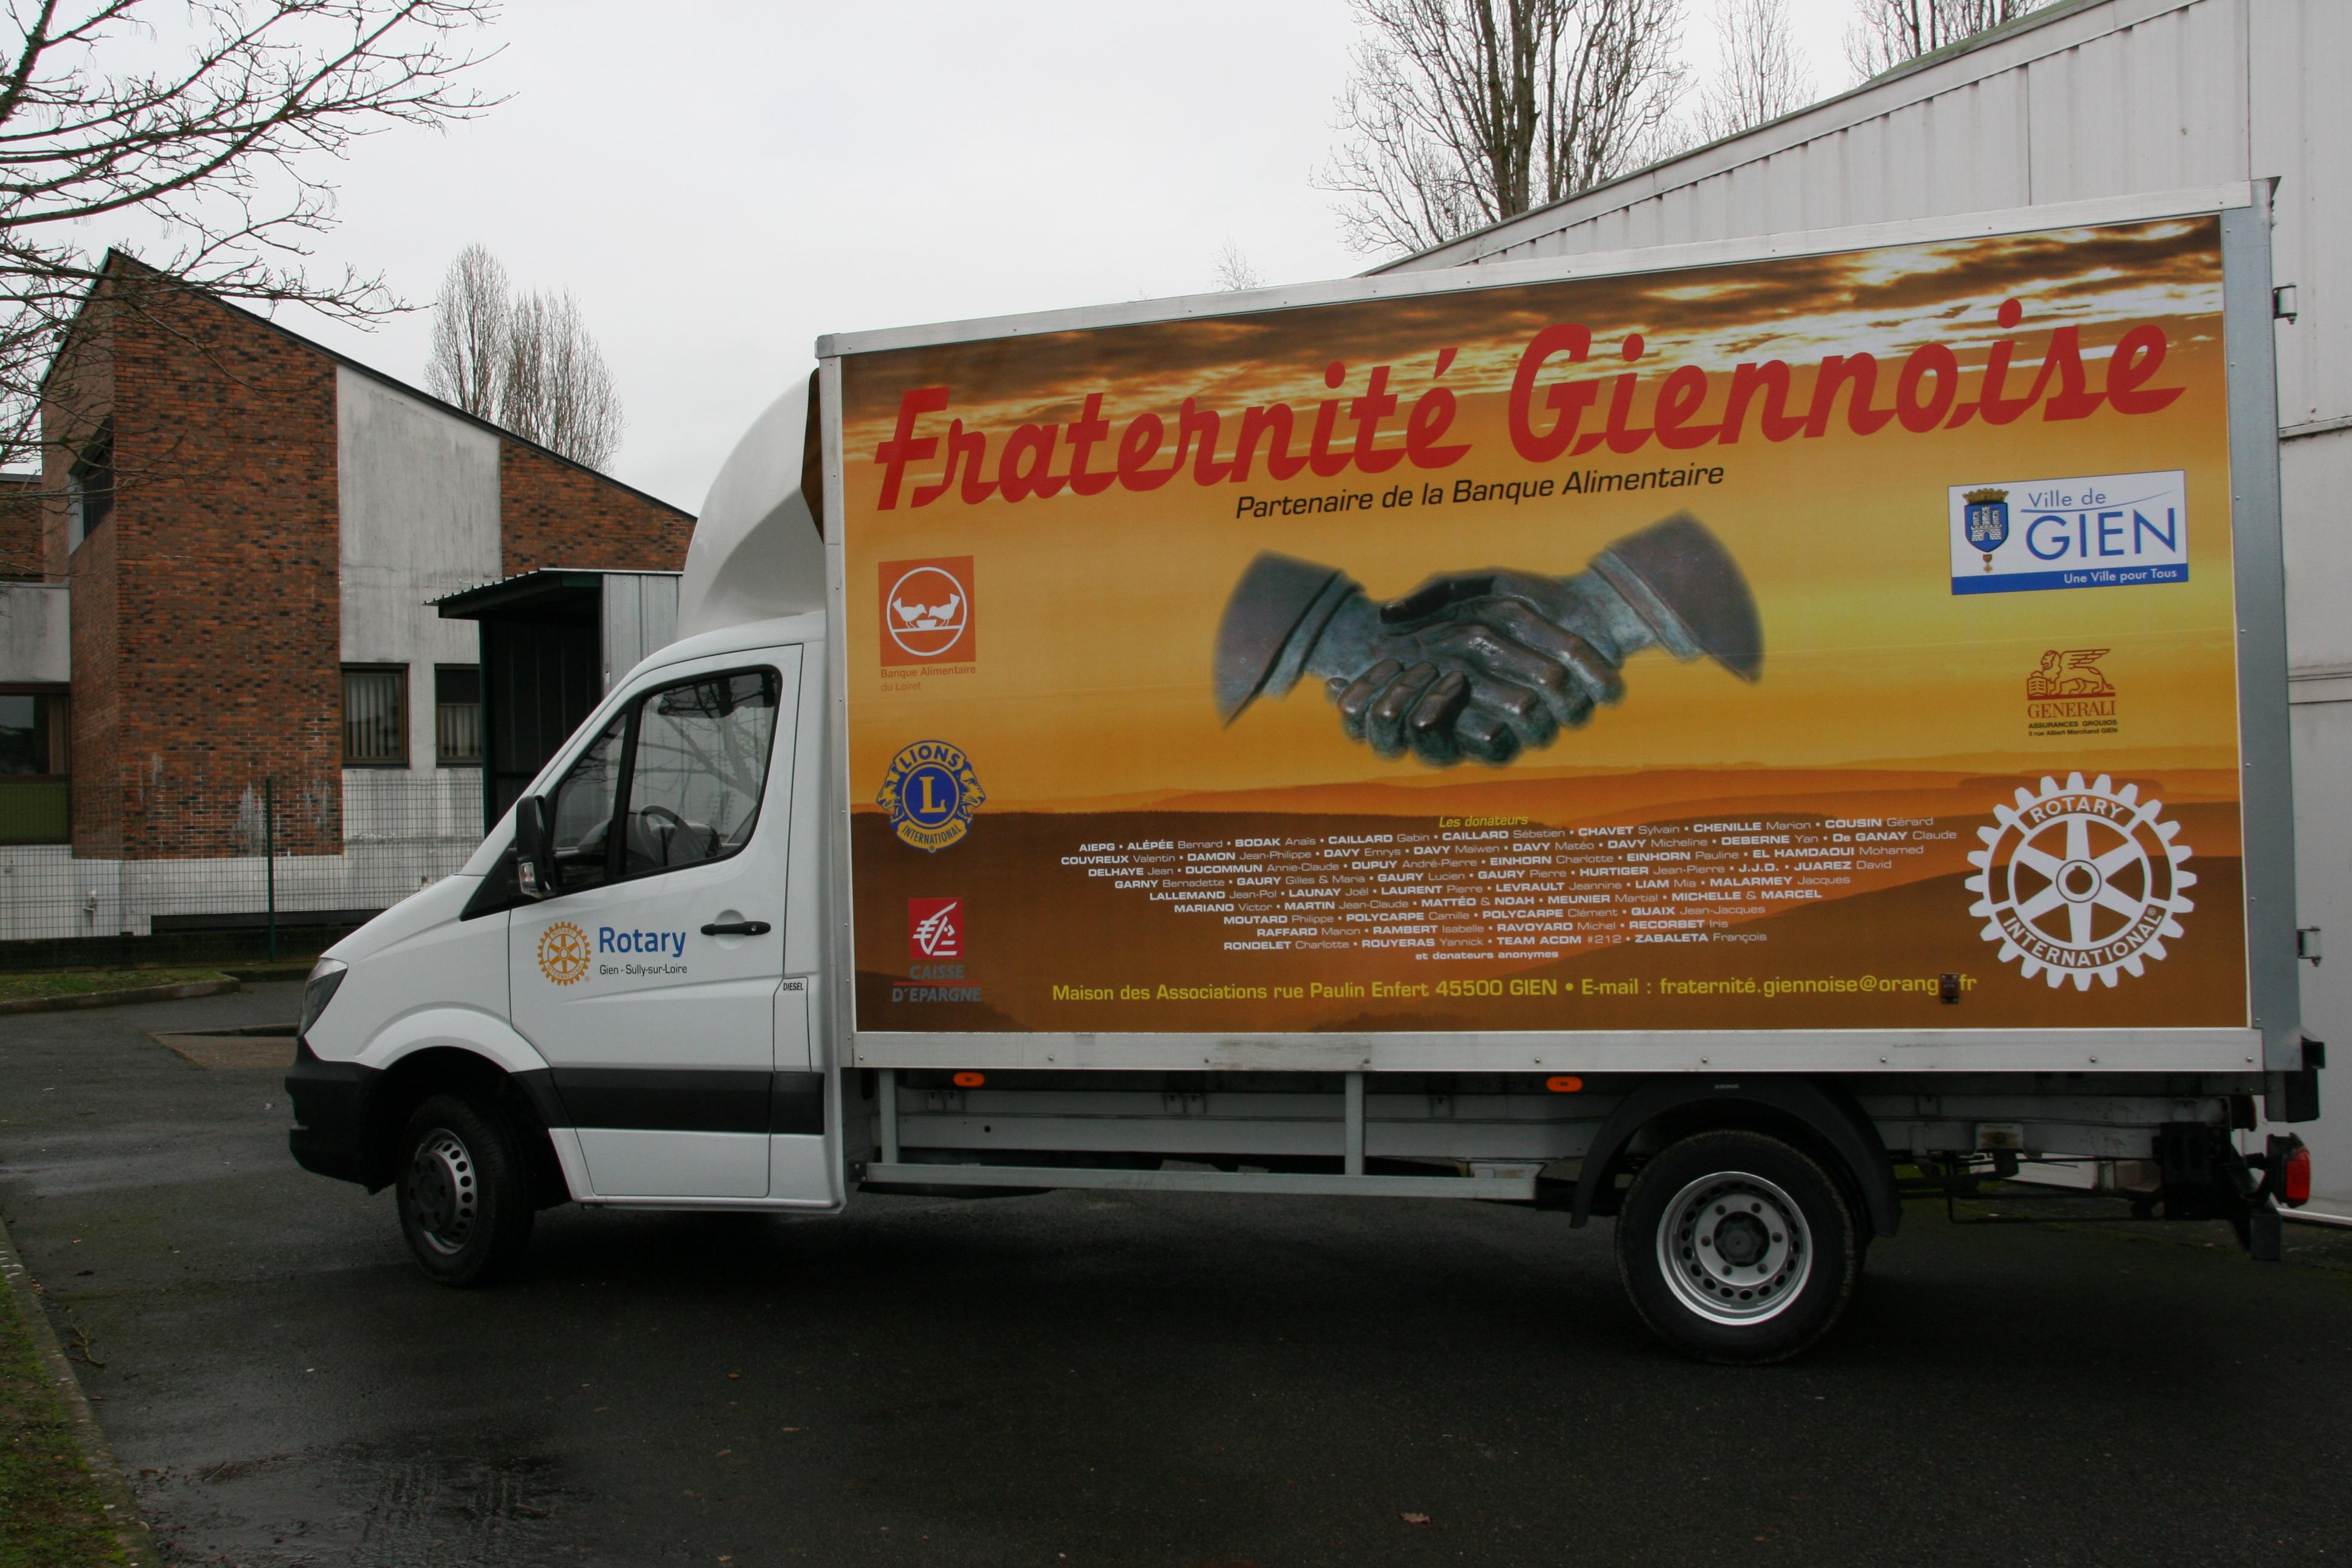 Camion Fraternité Giennoise 01 2018